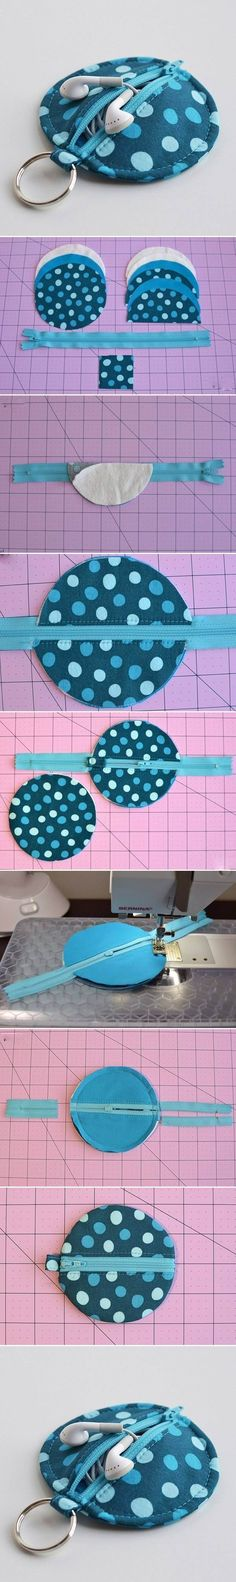 DIY Blue Polka Dot Earphone Case